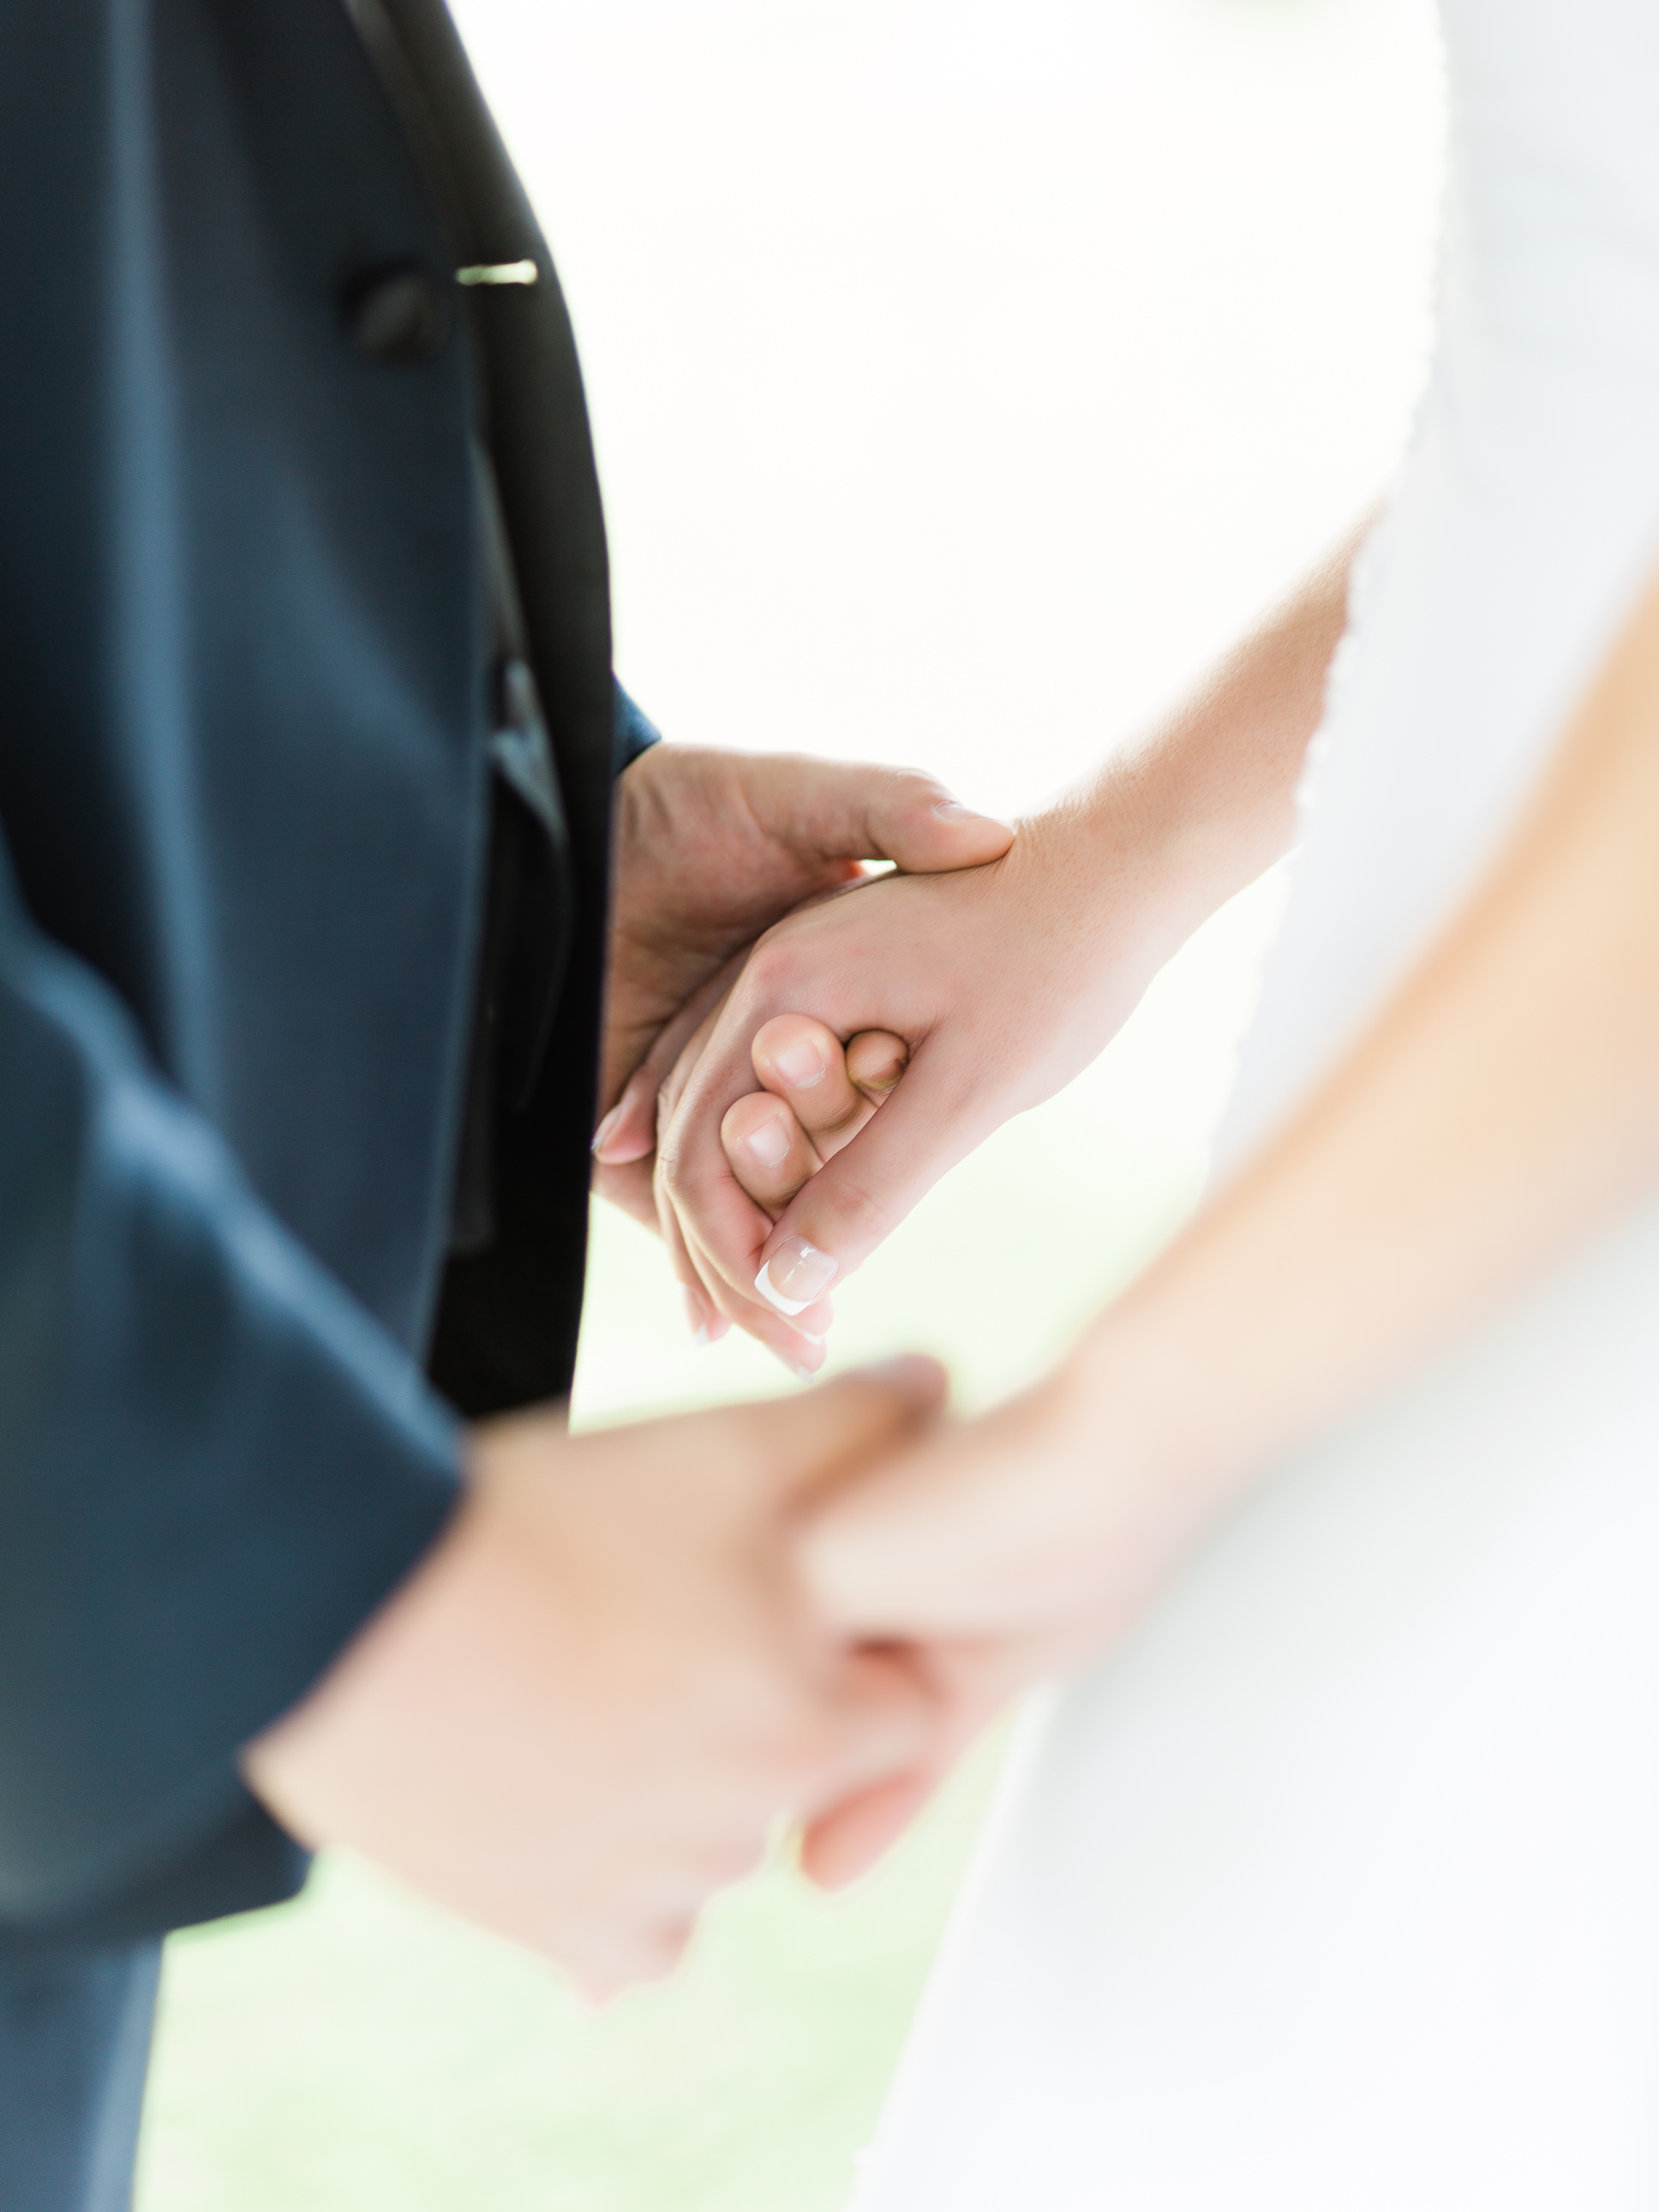 11_12_16_Robin_Mike_Pena_Wedding_2455-Edit.jpg